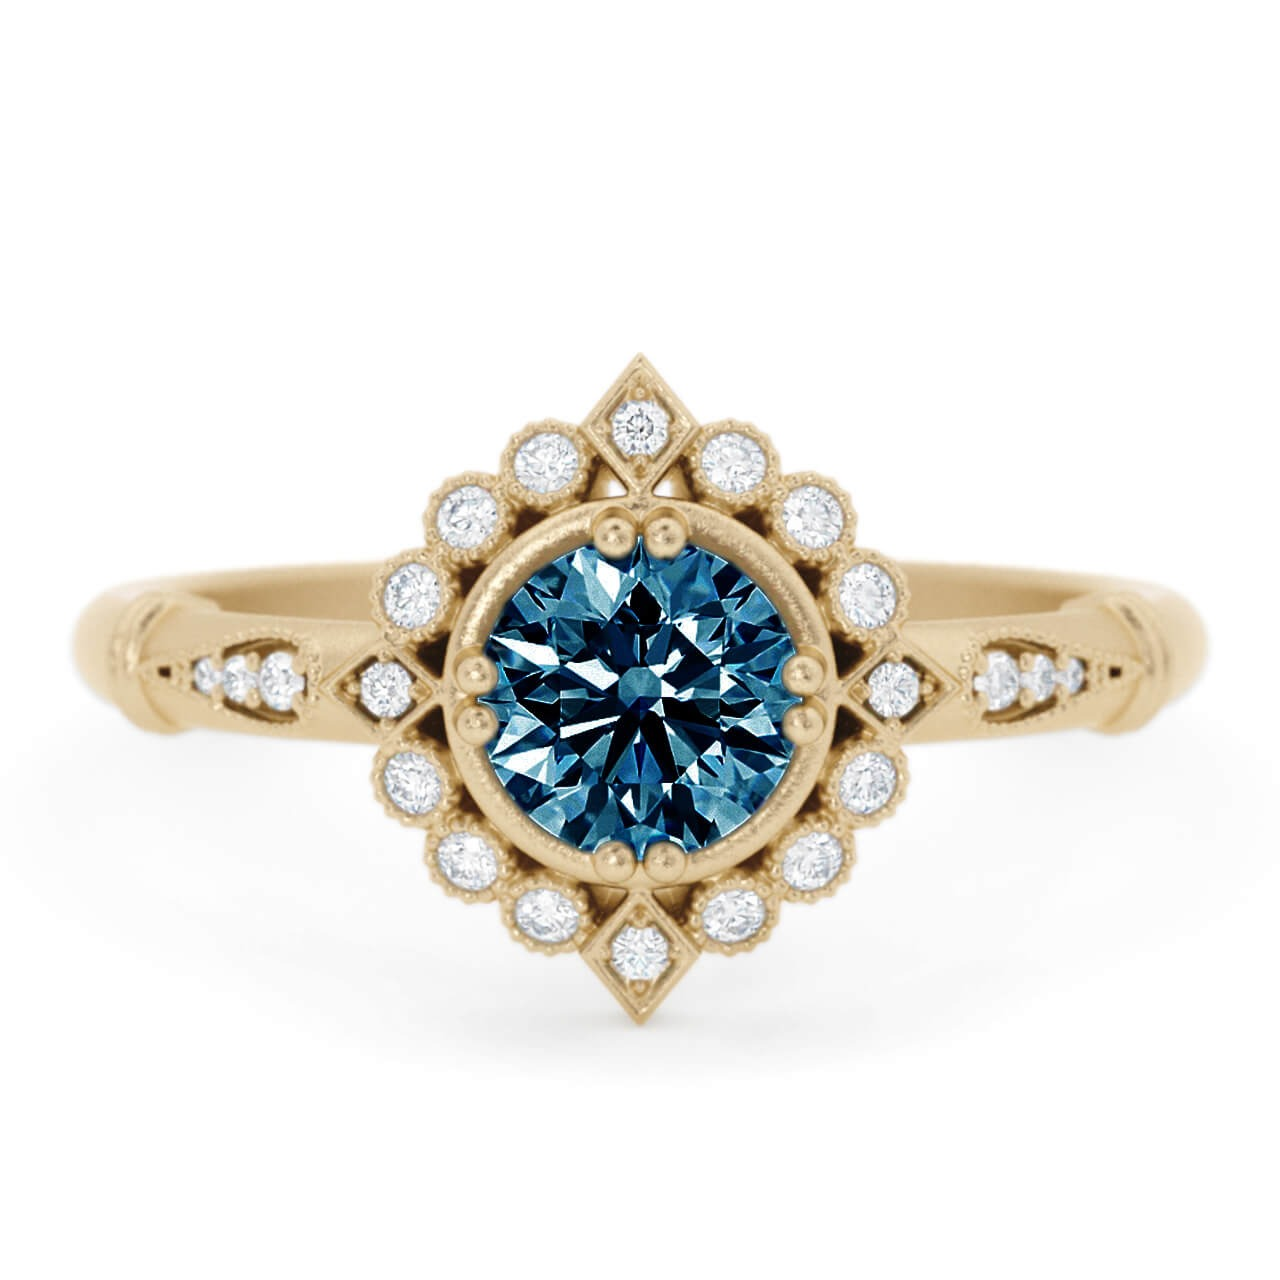 Frederica Montana Sapphire Ring